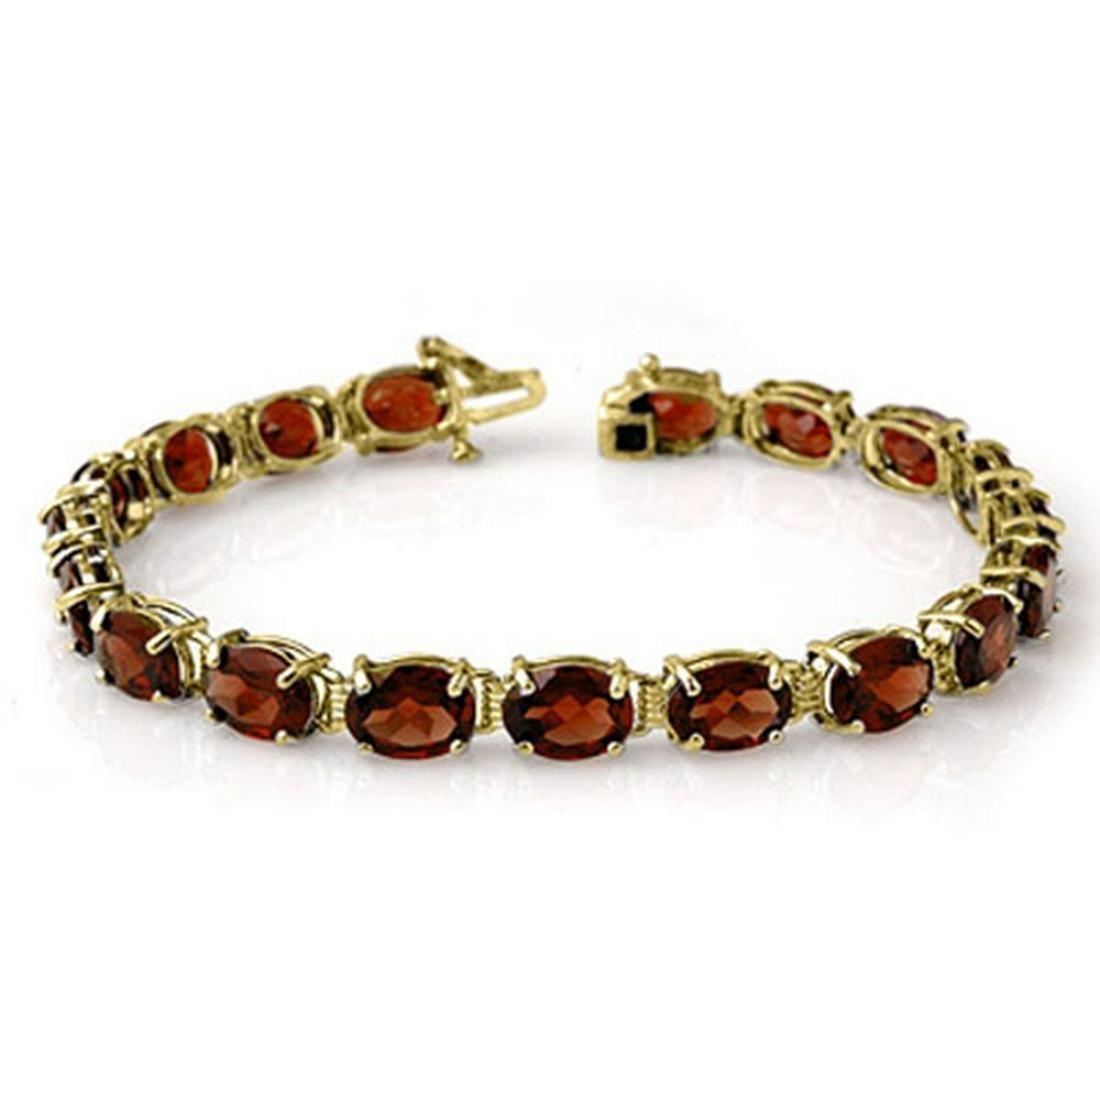 28.0 ctw Garnet Bracelet 10K Yellow Gold - REF-62V2Y -